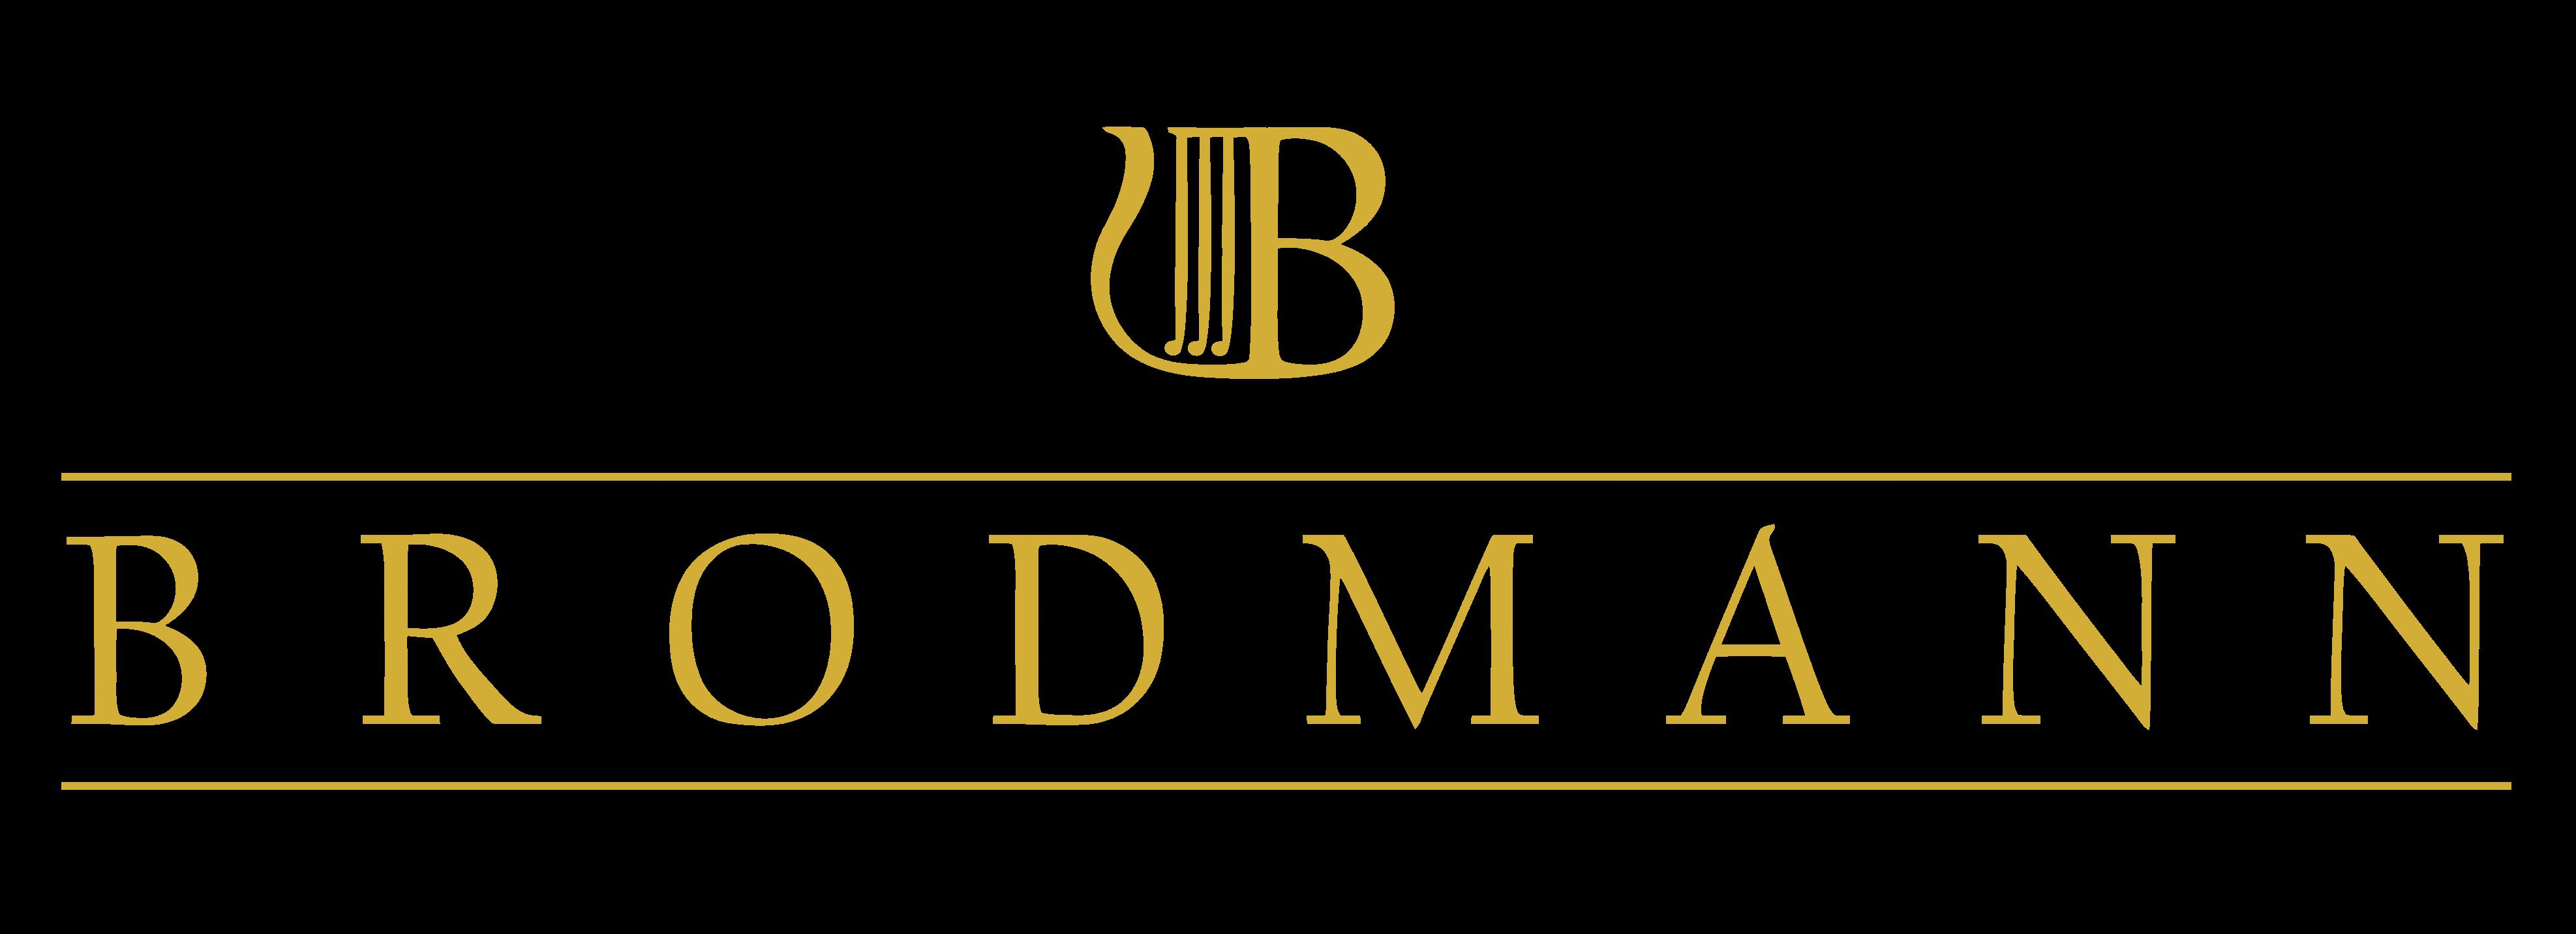 Brodmann Marquee